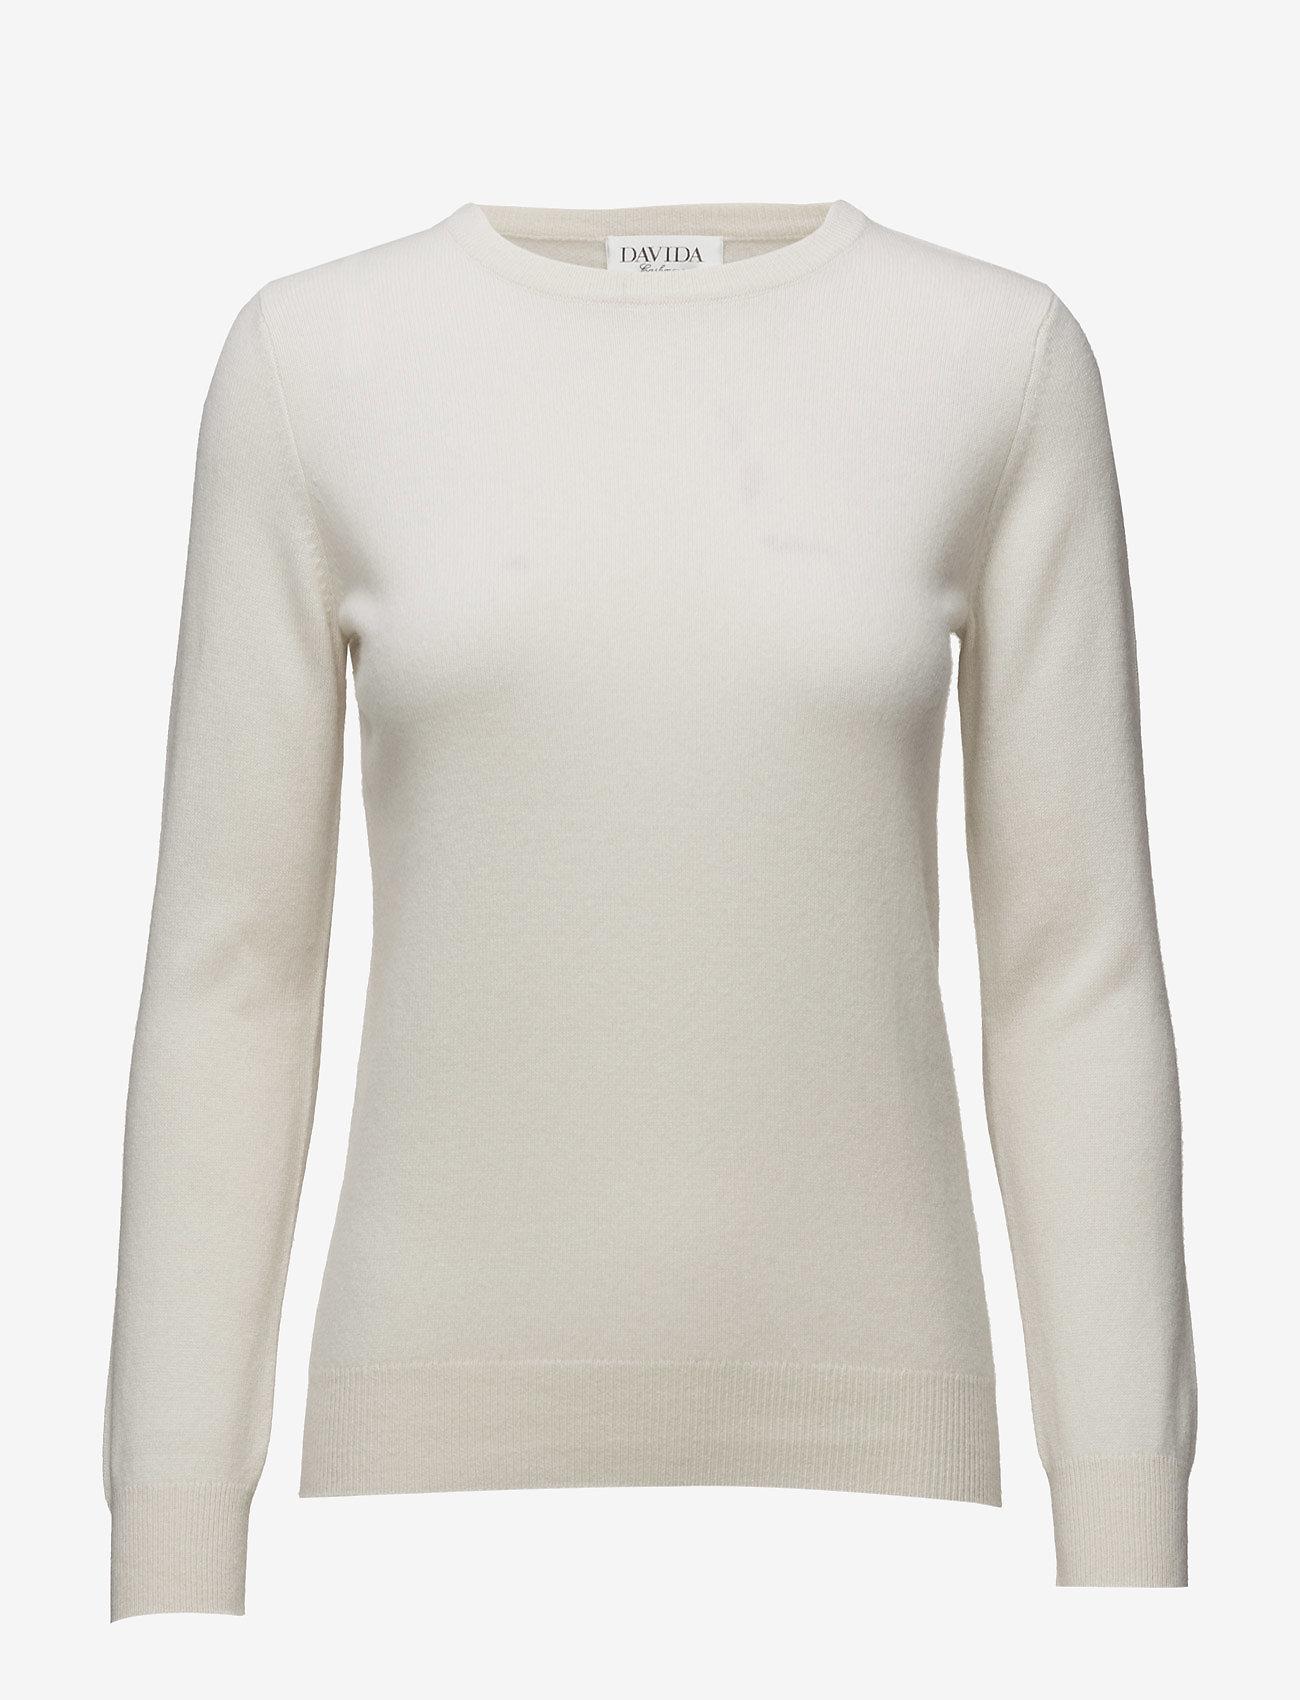 Davida Cashmere - Basic sweater - sweaters - white - 0